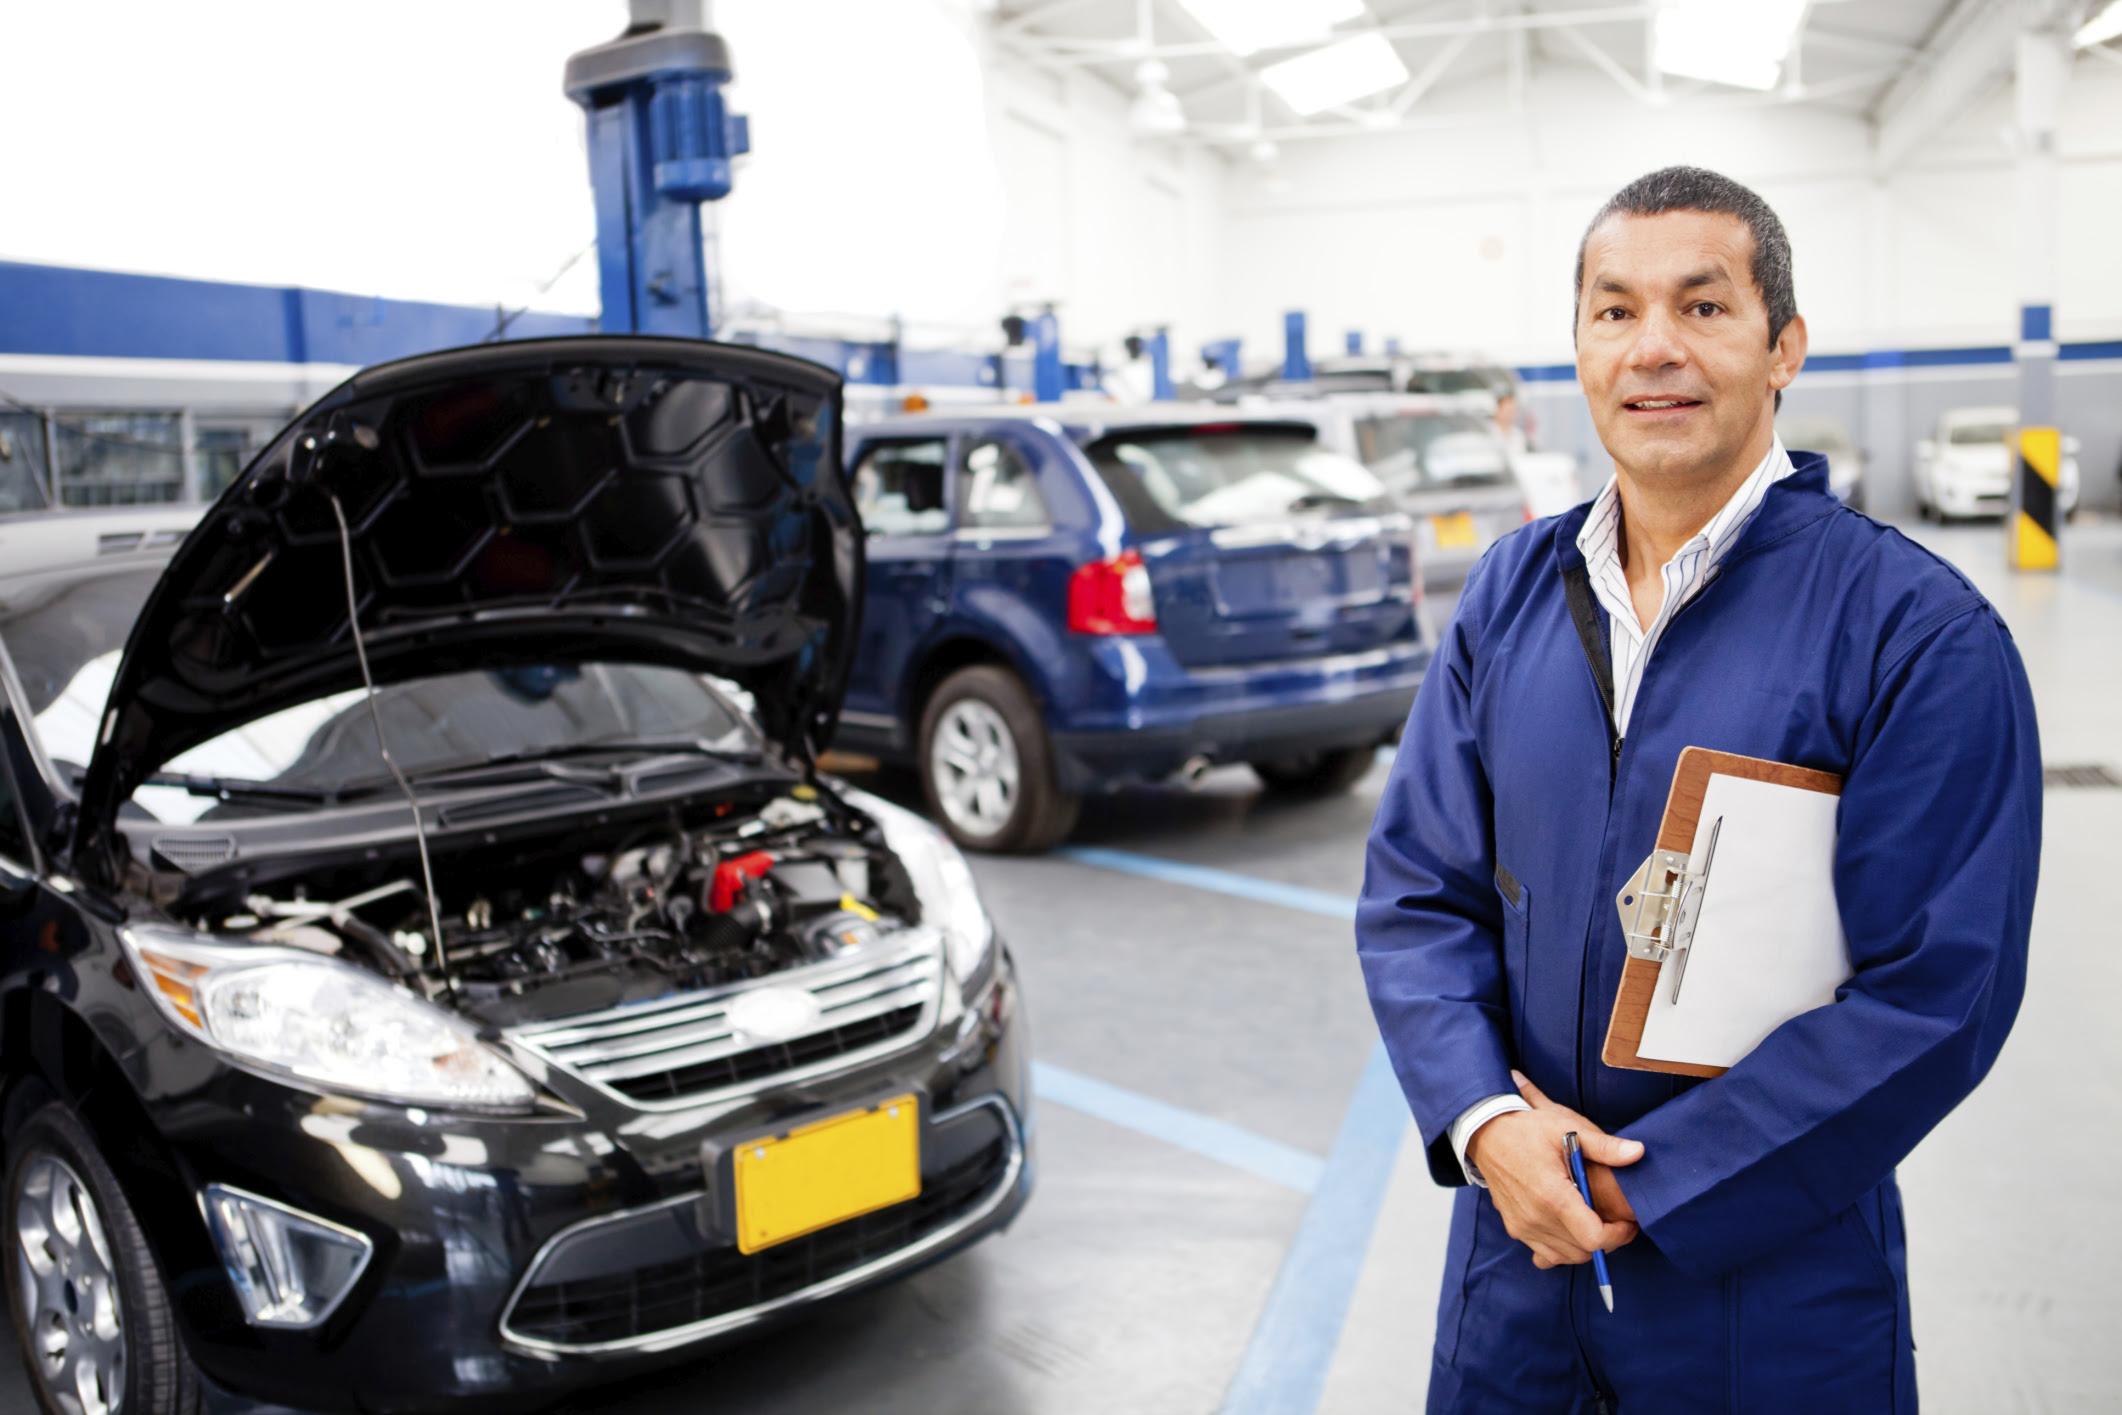 Job Description of a Service Advisor  Career Trend